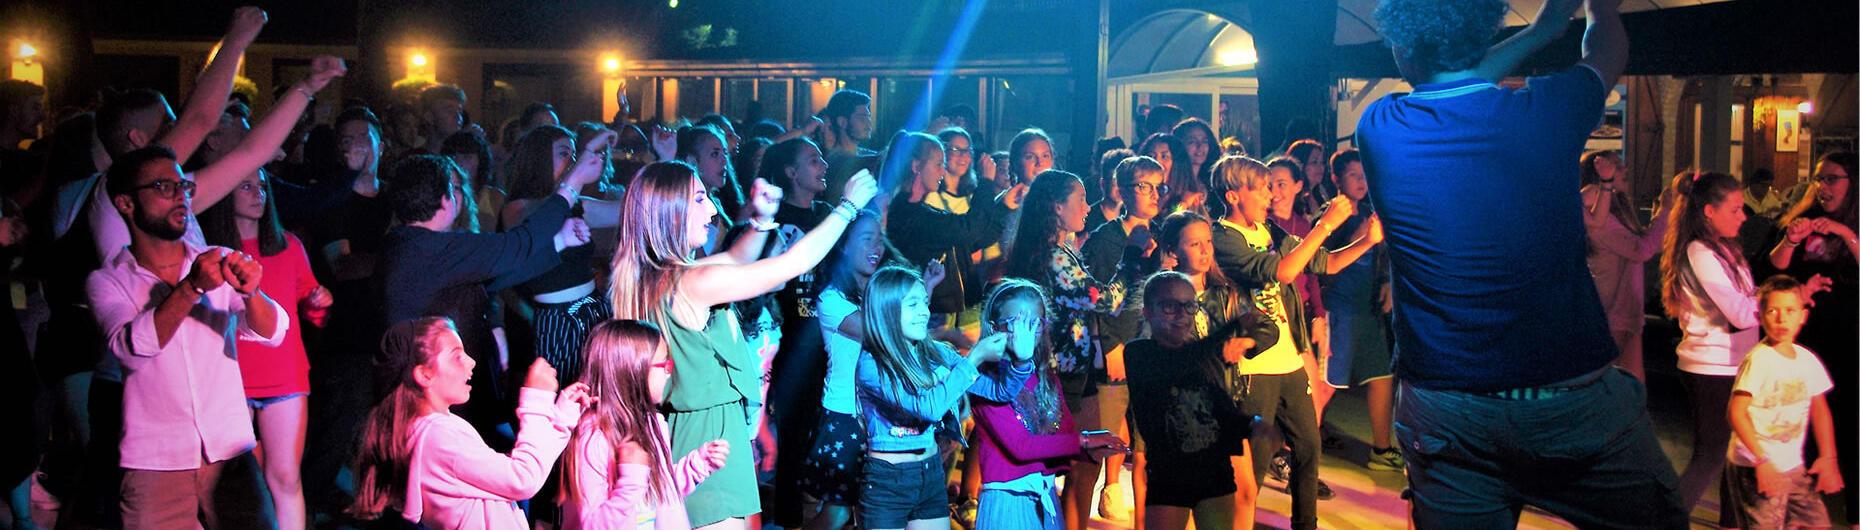 vacanzespinnaker fr evenements-marches 004